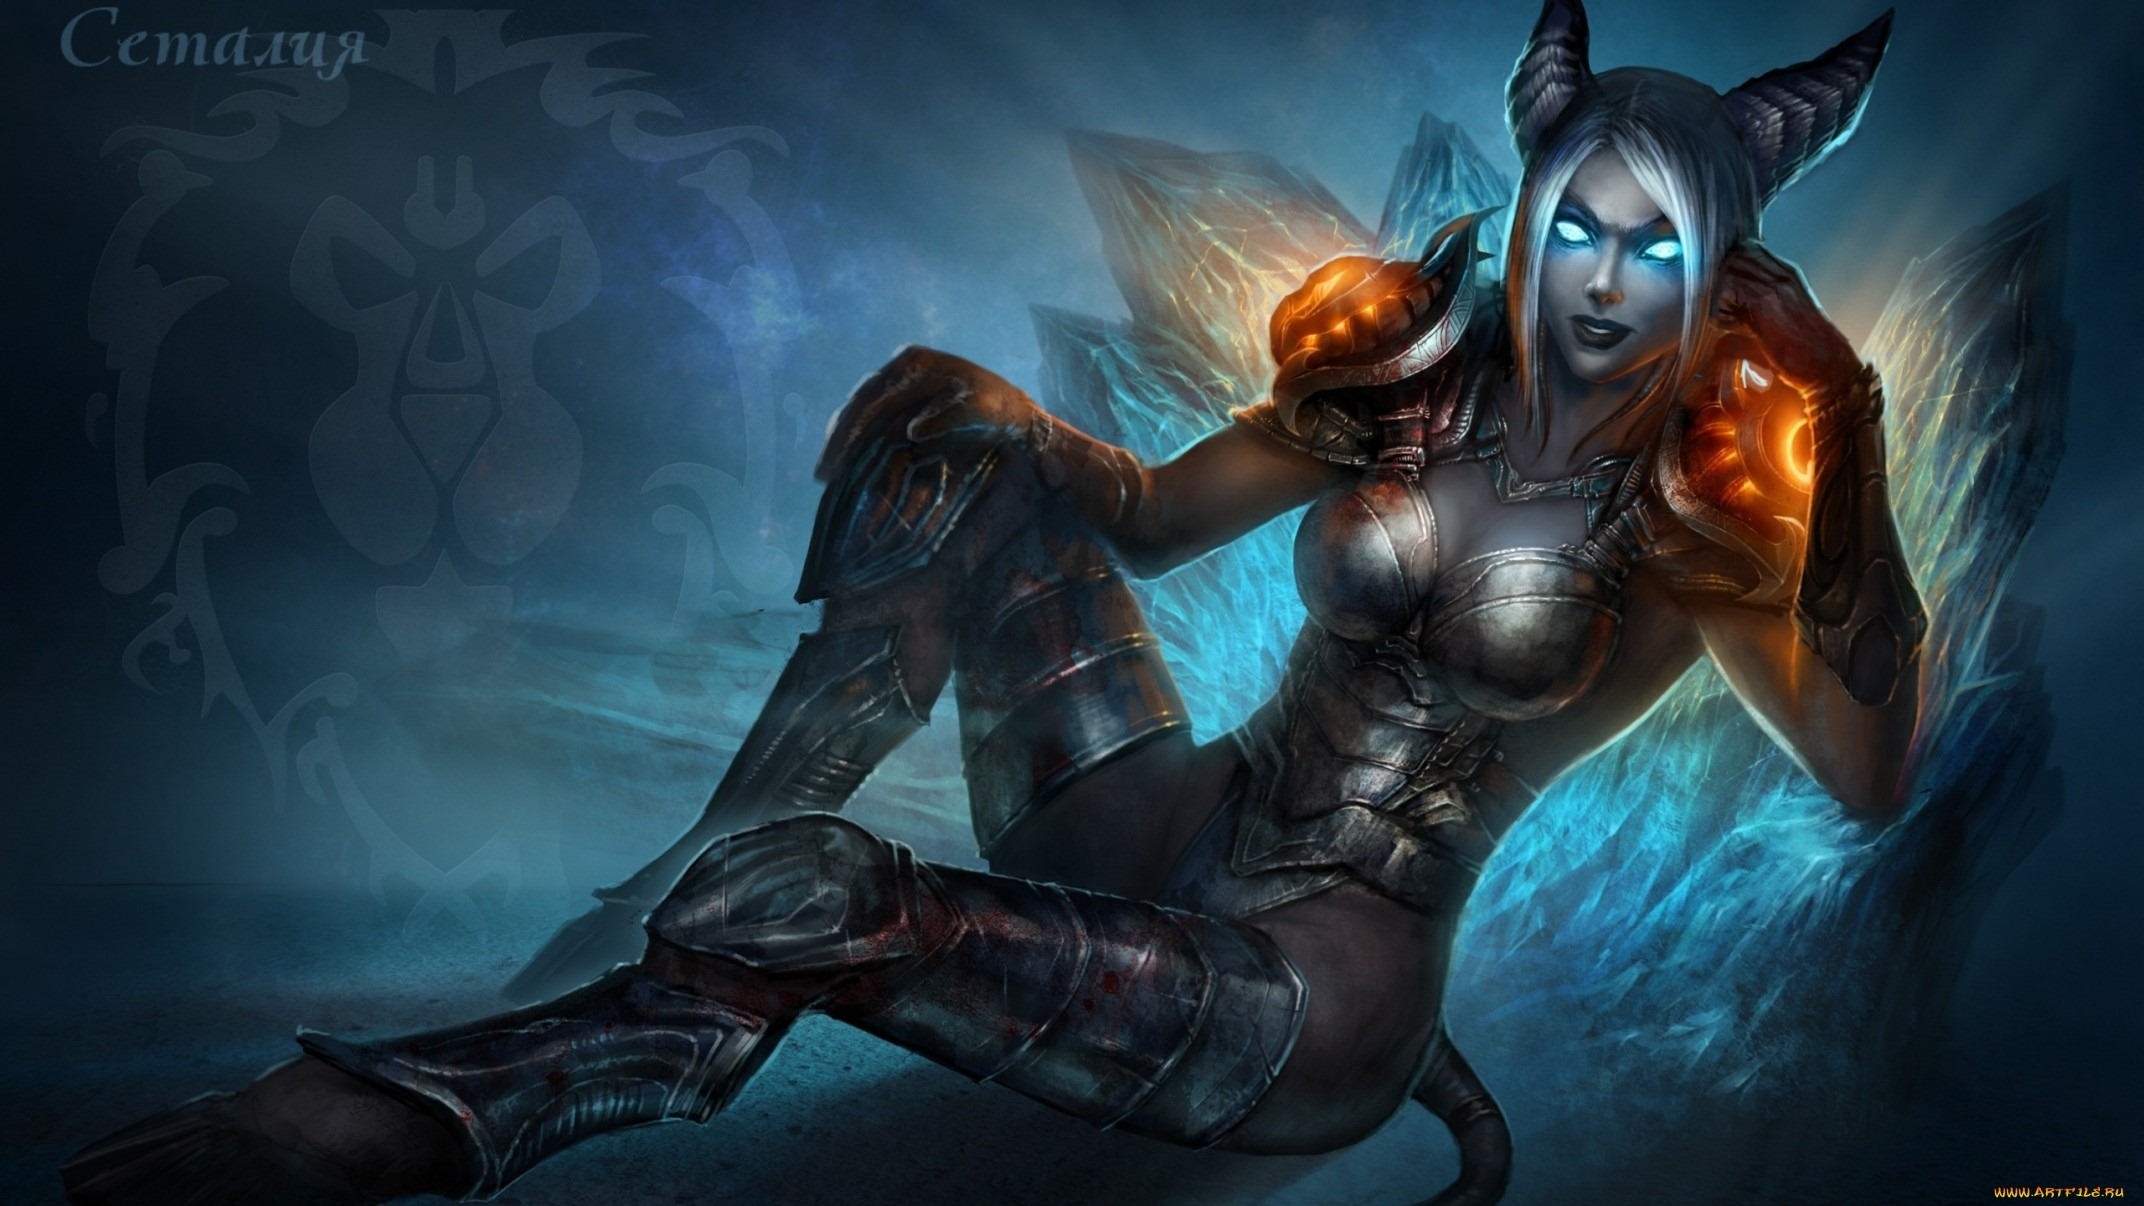 Demon girl wallpaper wallpapersafari - Hot demon women ...